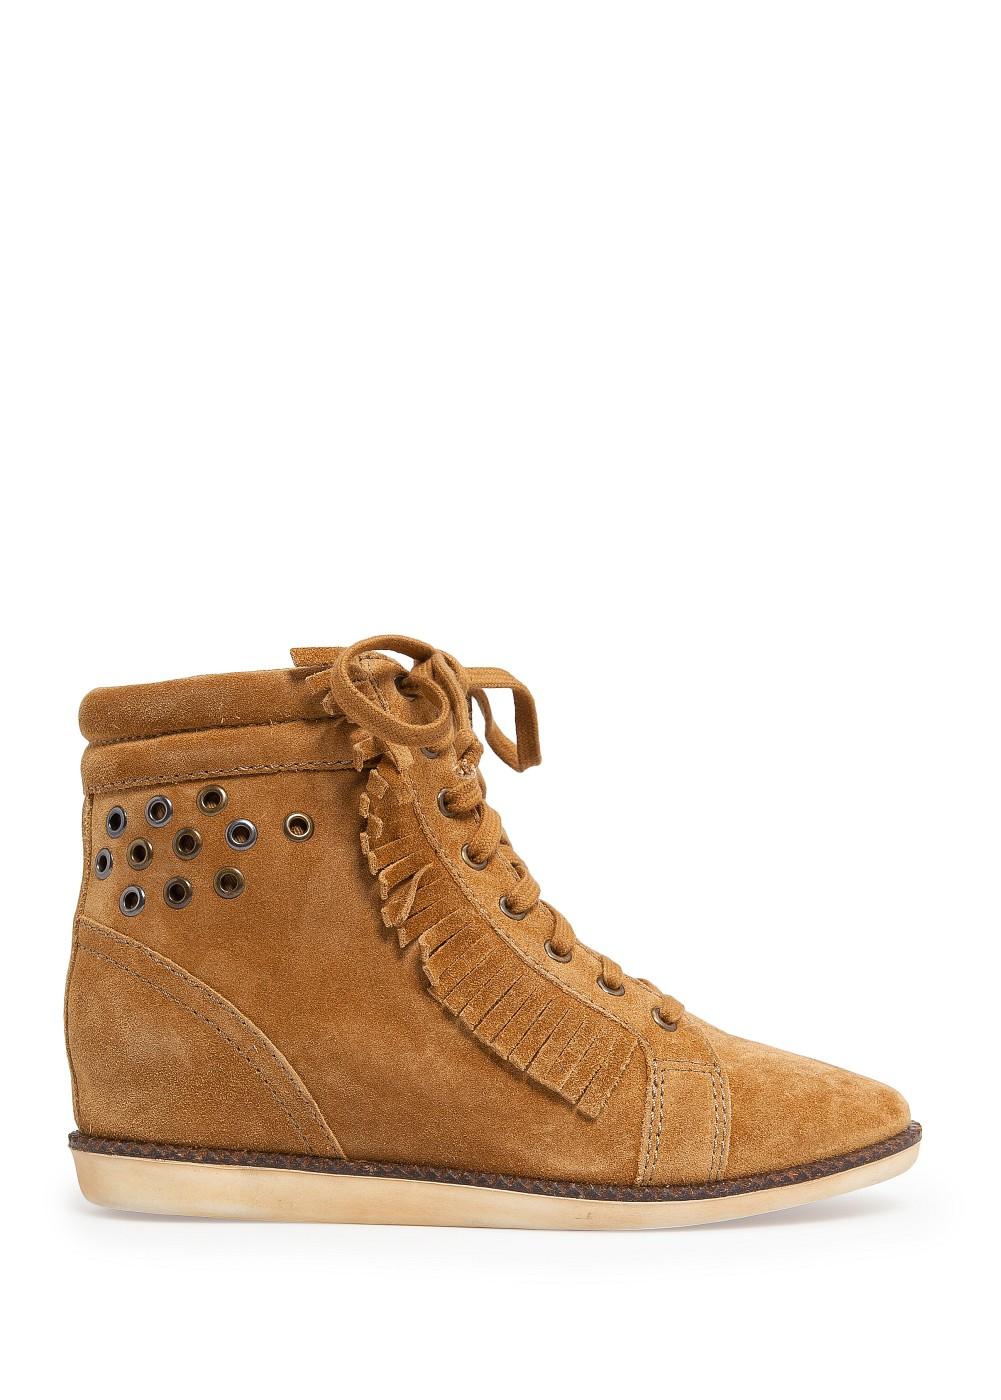 Tommy Bahama Shoe Canada